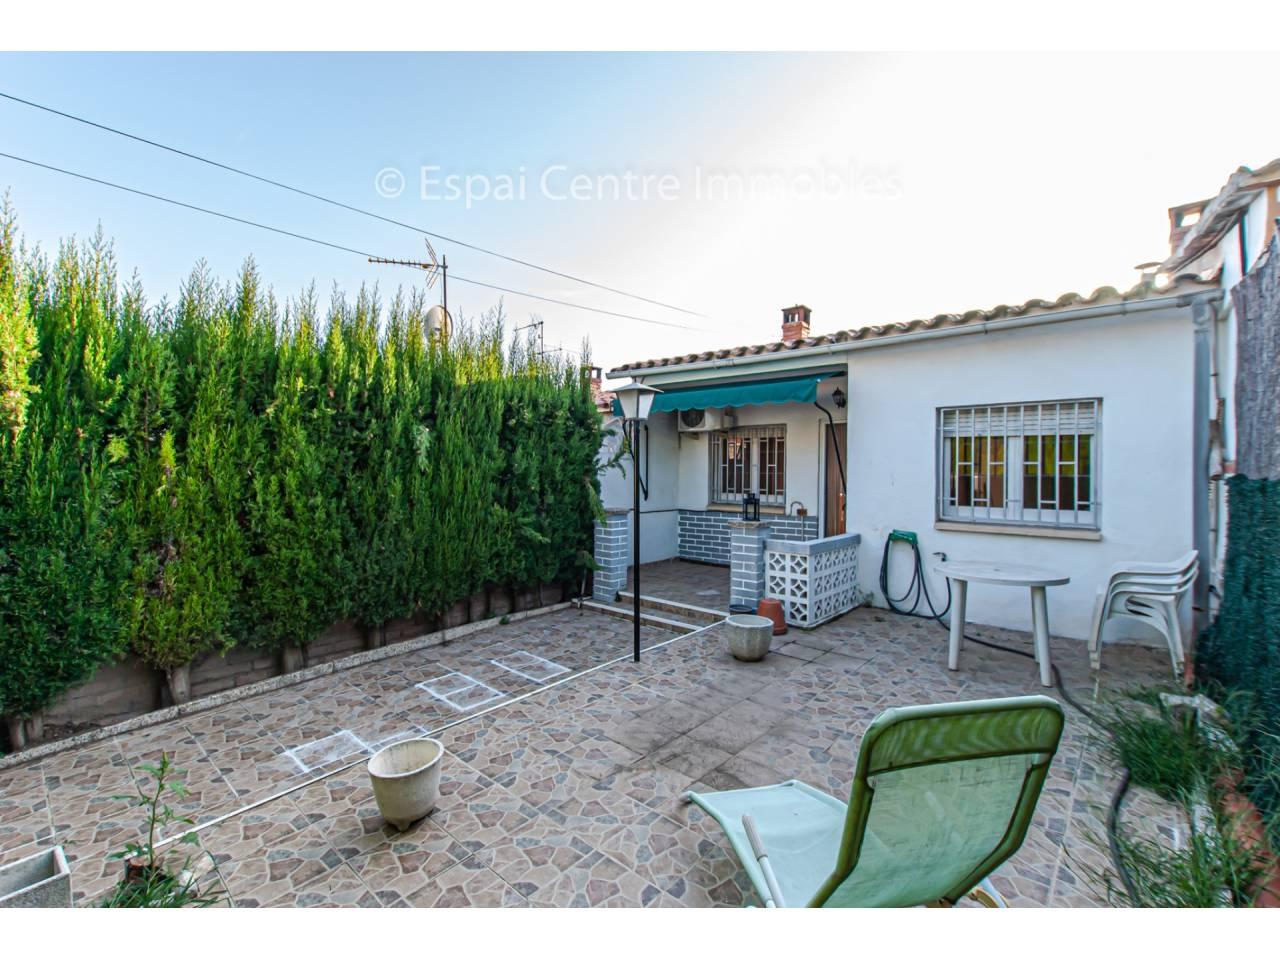 Affitto Casa  Calle gardenia. Superficie total 55 m², casa superficie solar 112 m², superficie